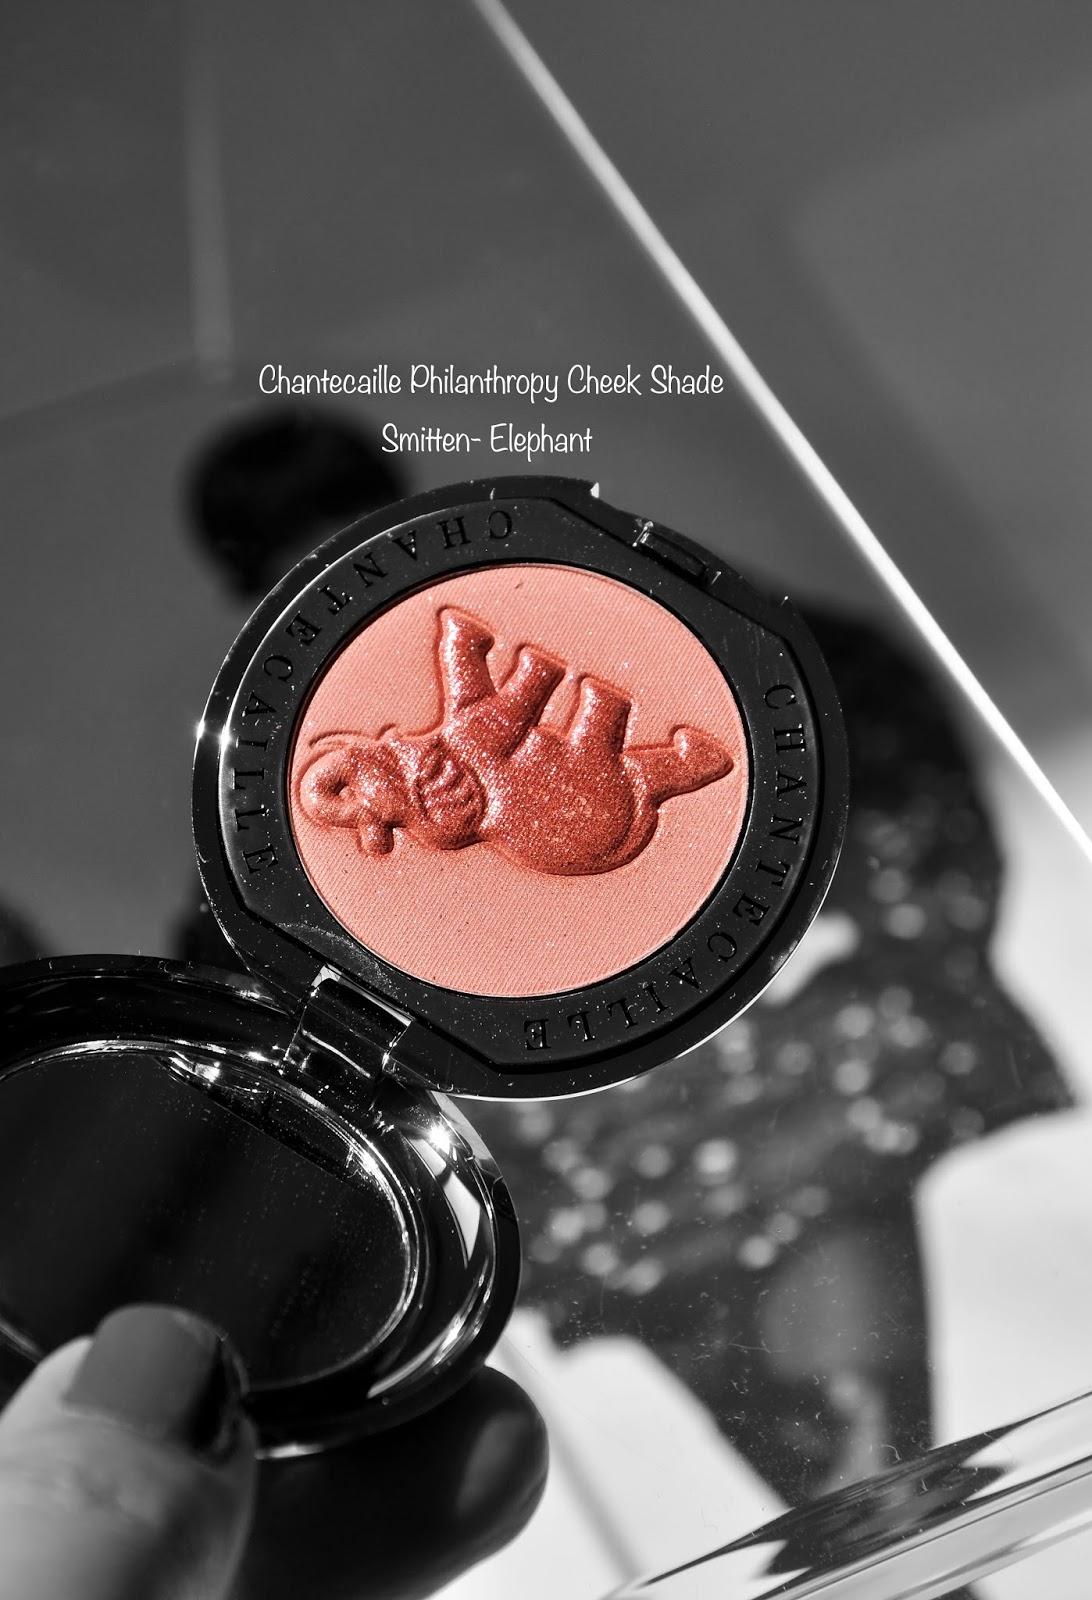 Chantecaille Philanthropy Cheek Shade Smitten-Elephant swatches